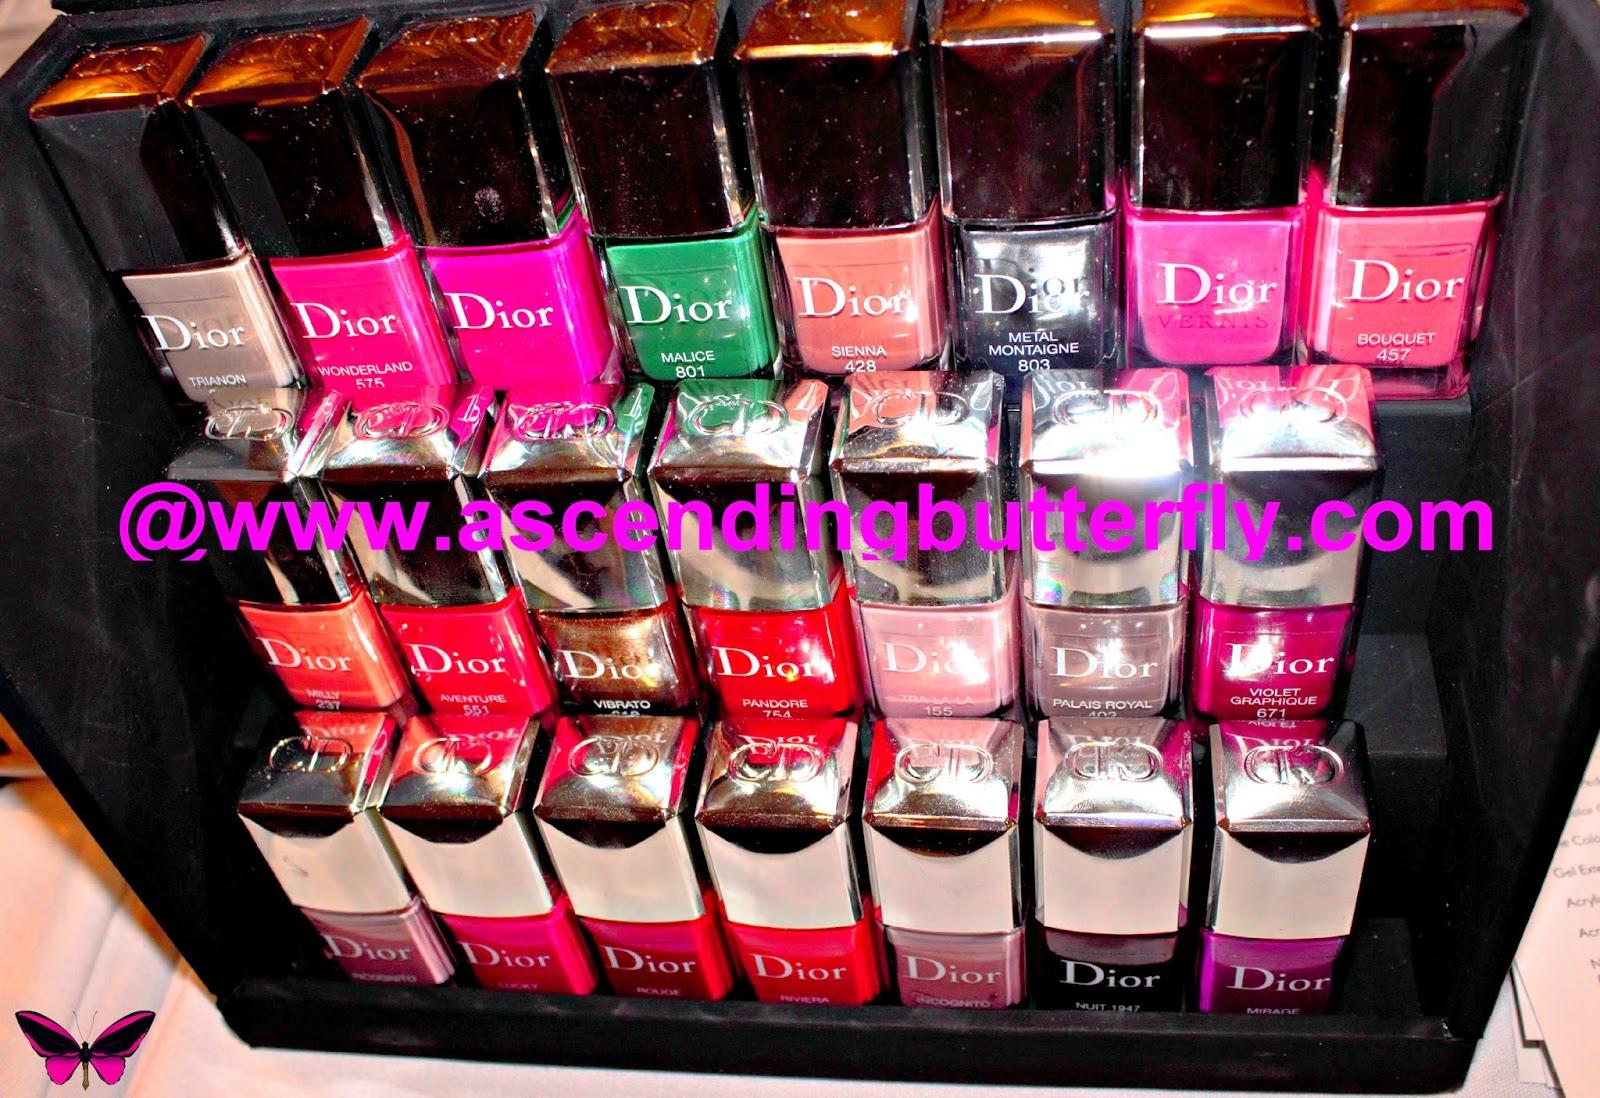 Christian Dior Nail Polish on display at Getting Gorgeous 2014